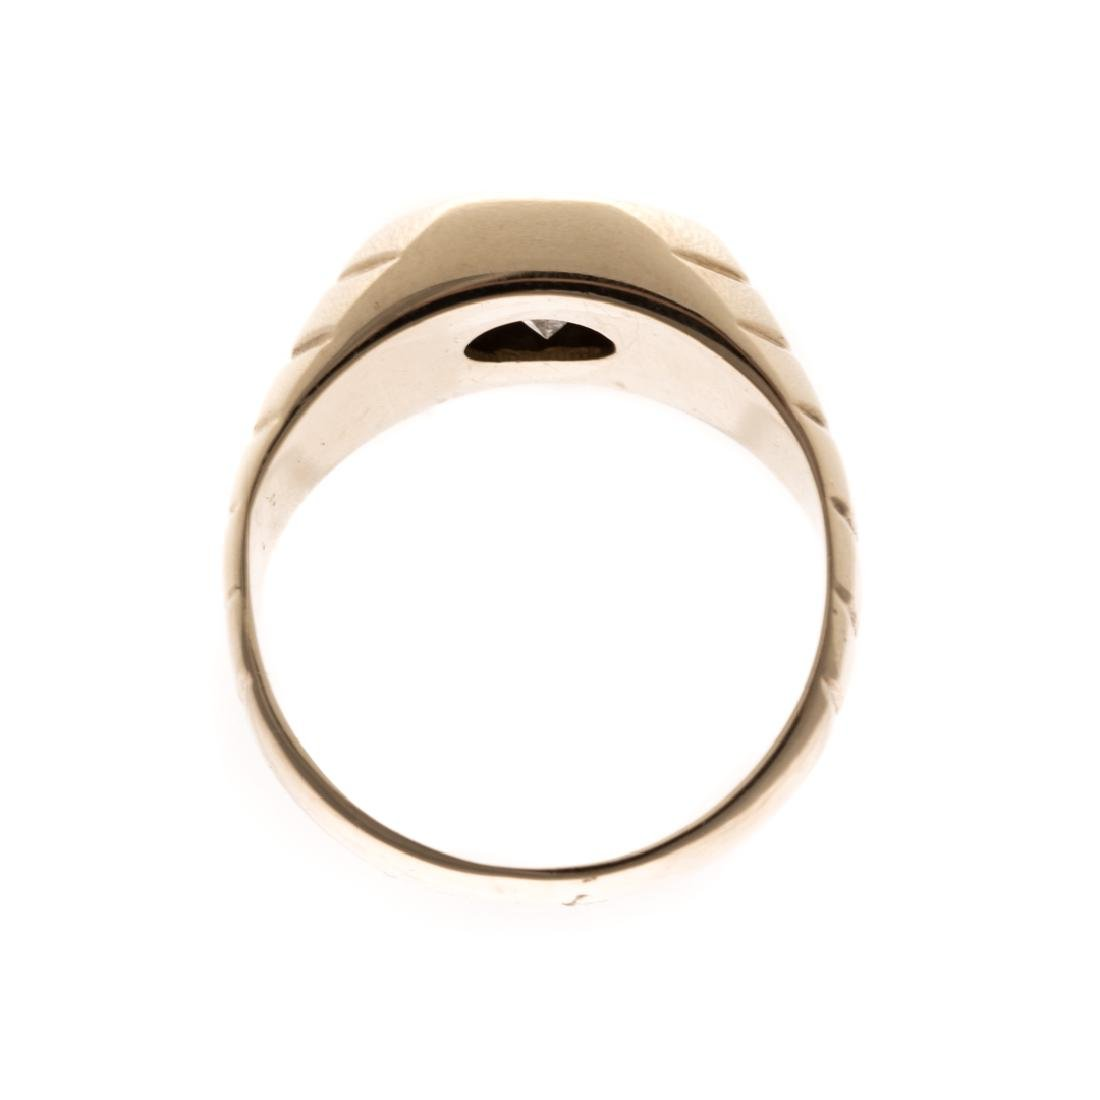 A Gentleman's Diamond Ring in 14K Gold - 3